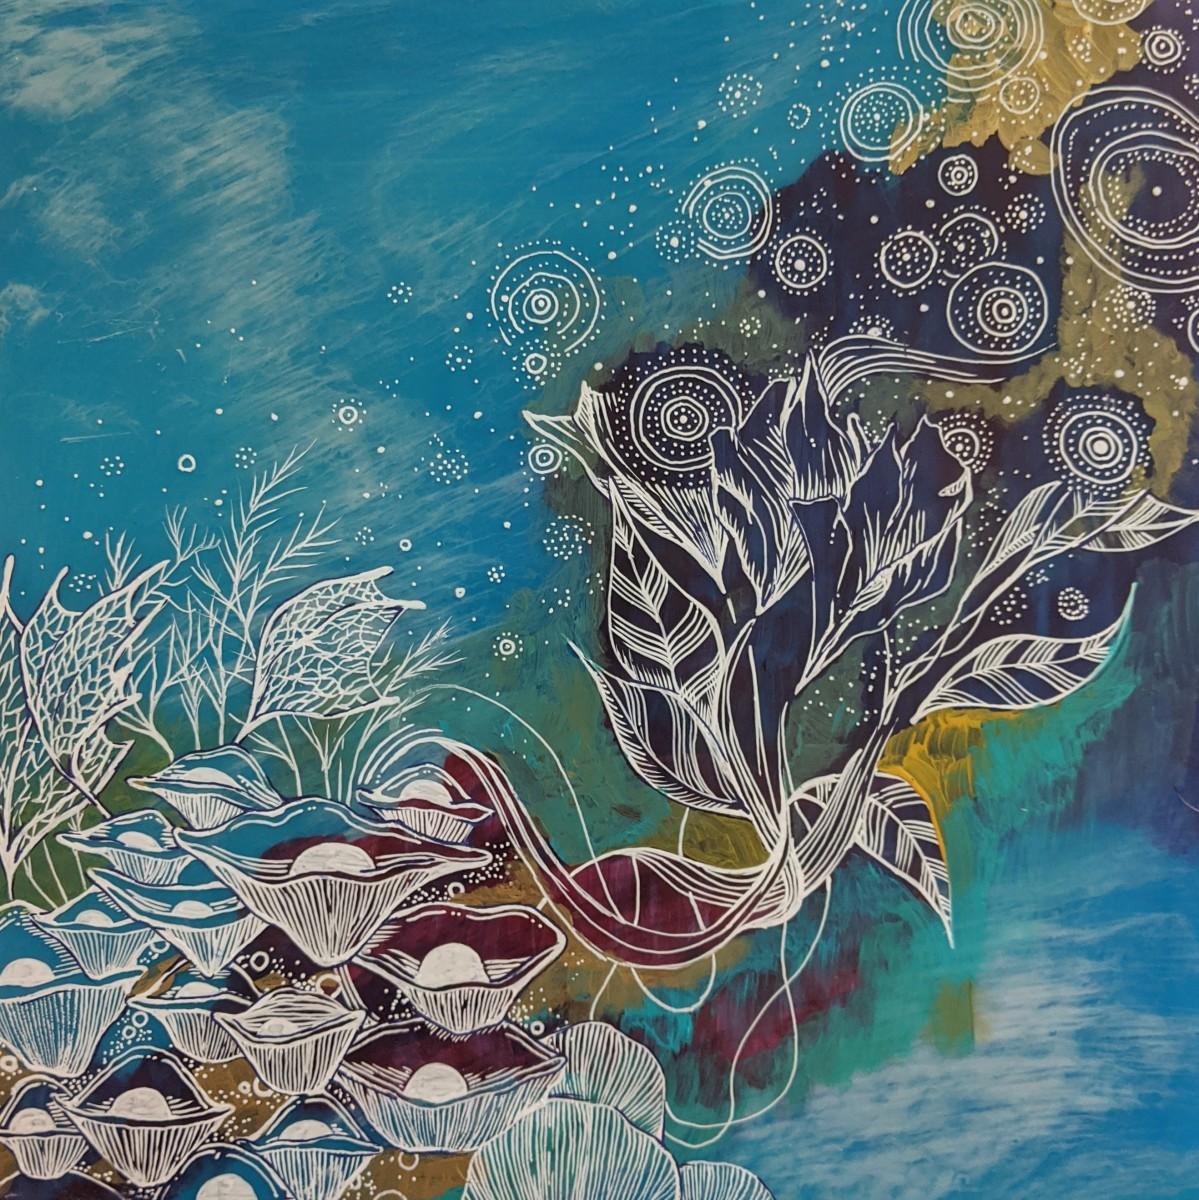 creation by Kellie Kawahara-Niimi